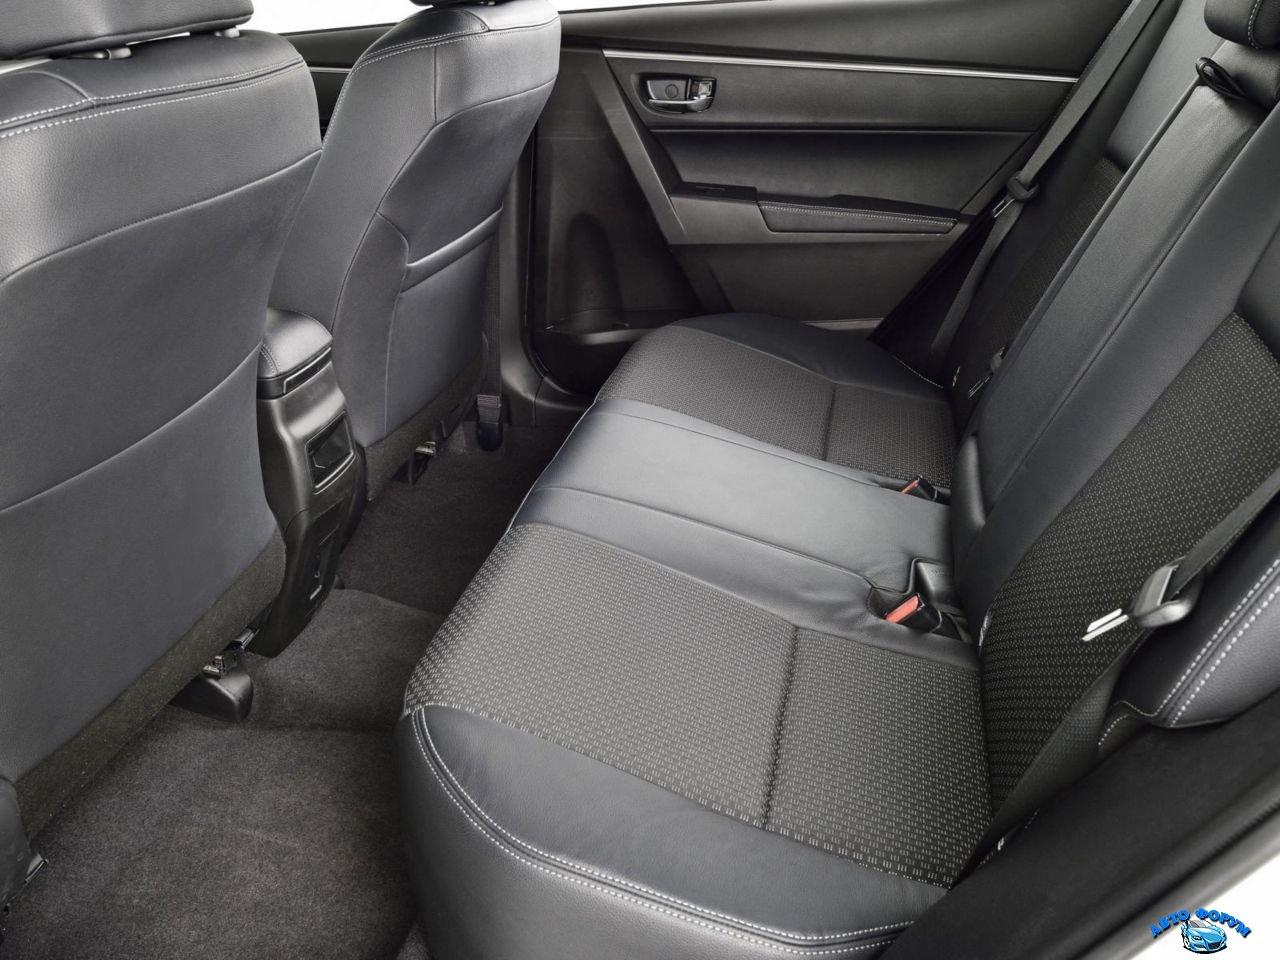 Toyota Corolla-6.jpg